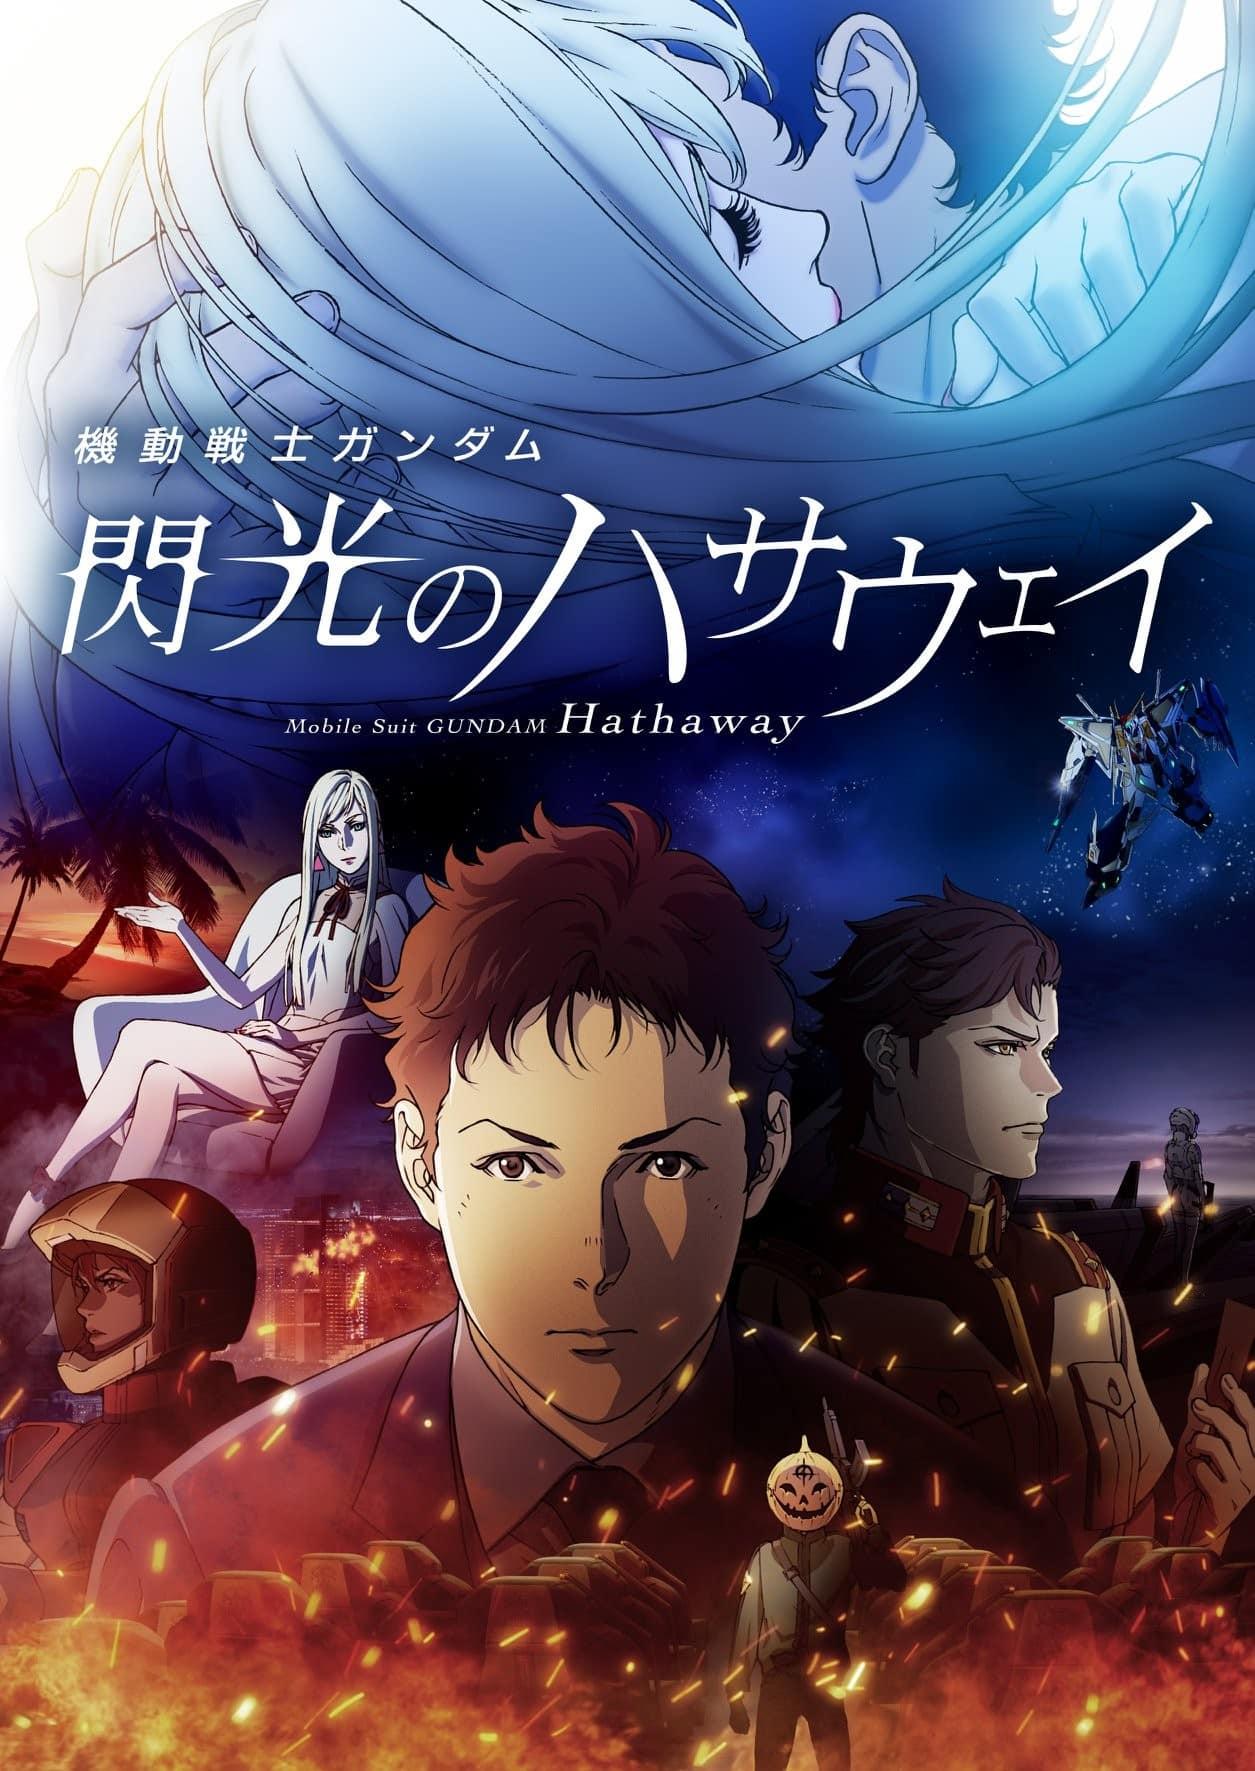 Mobile Suit Gundam: Hathaway (2021) โมบิลสูทกันดั้ม ฮาธาเวย์ส แฟลช